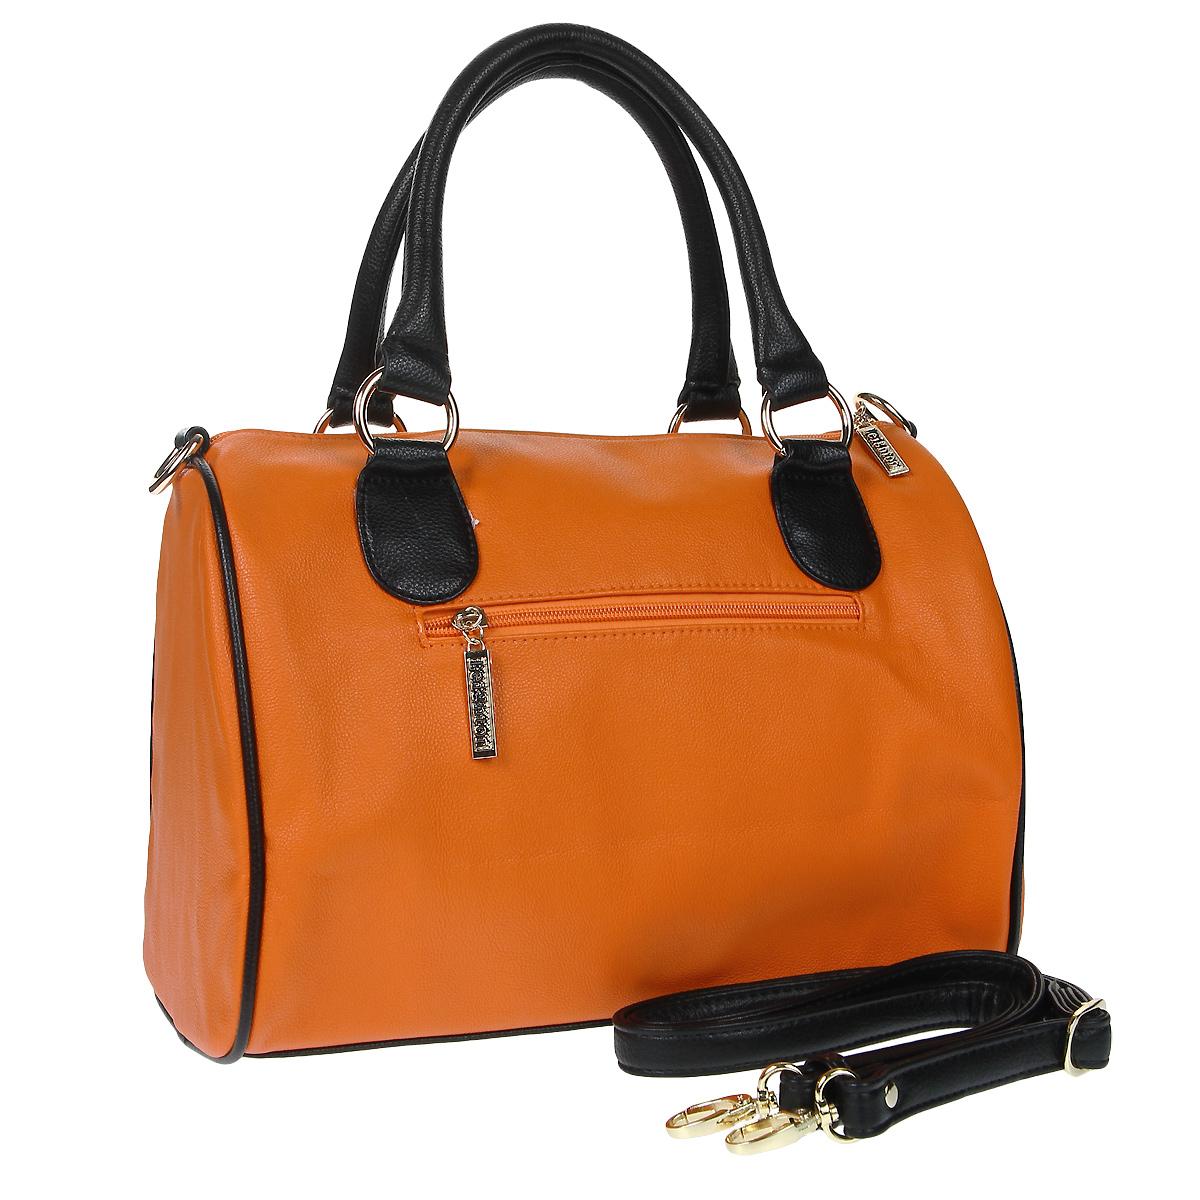 "Сумка женская ""Leighton"", цвет: оранжевый. 550429-200 ( 550429-200/51/200/1 )"